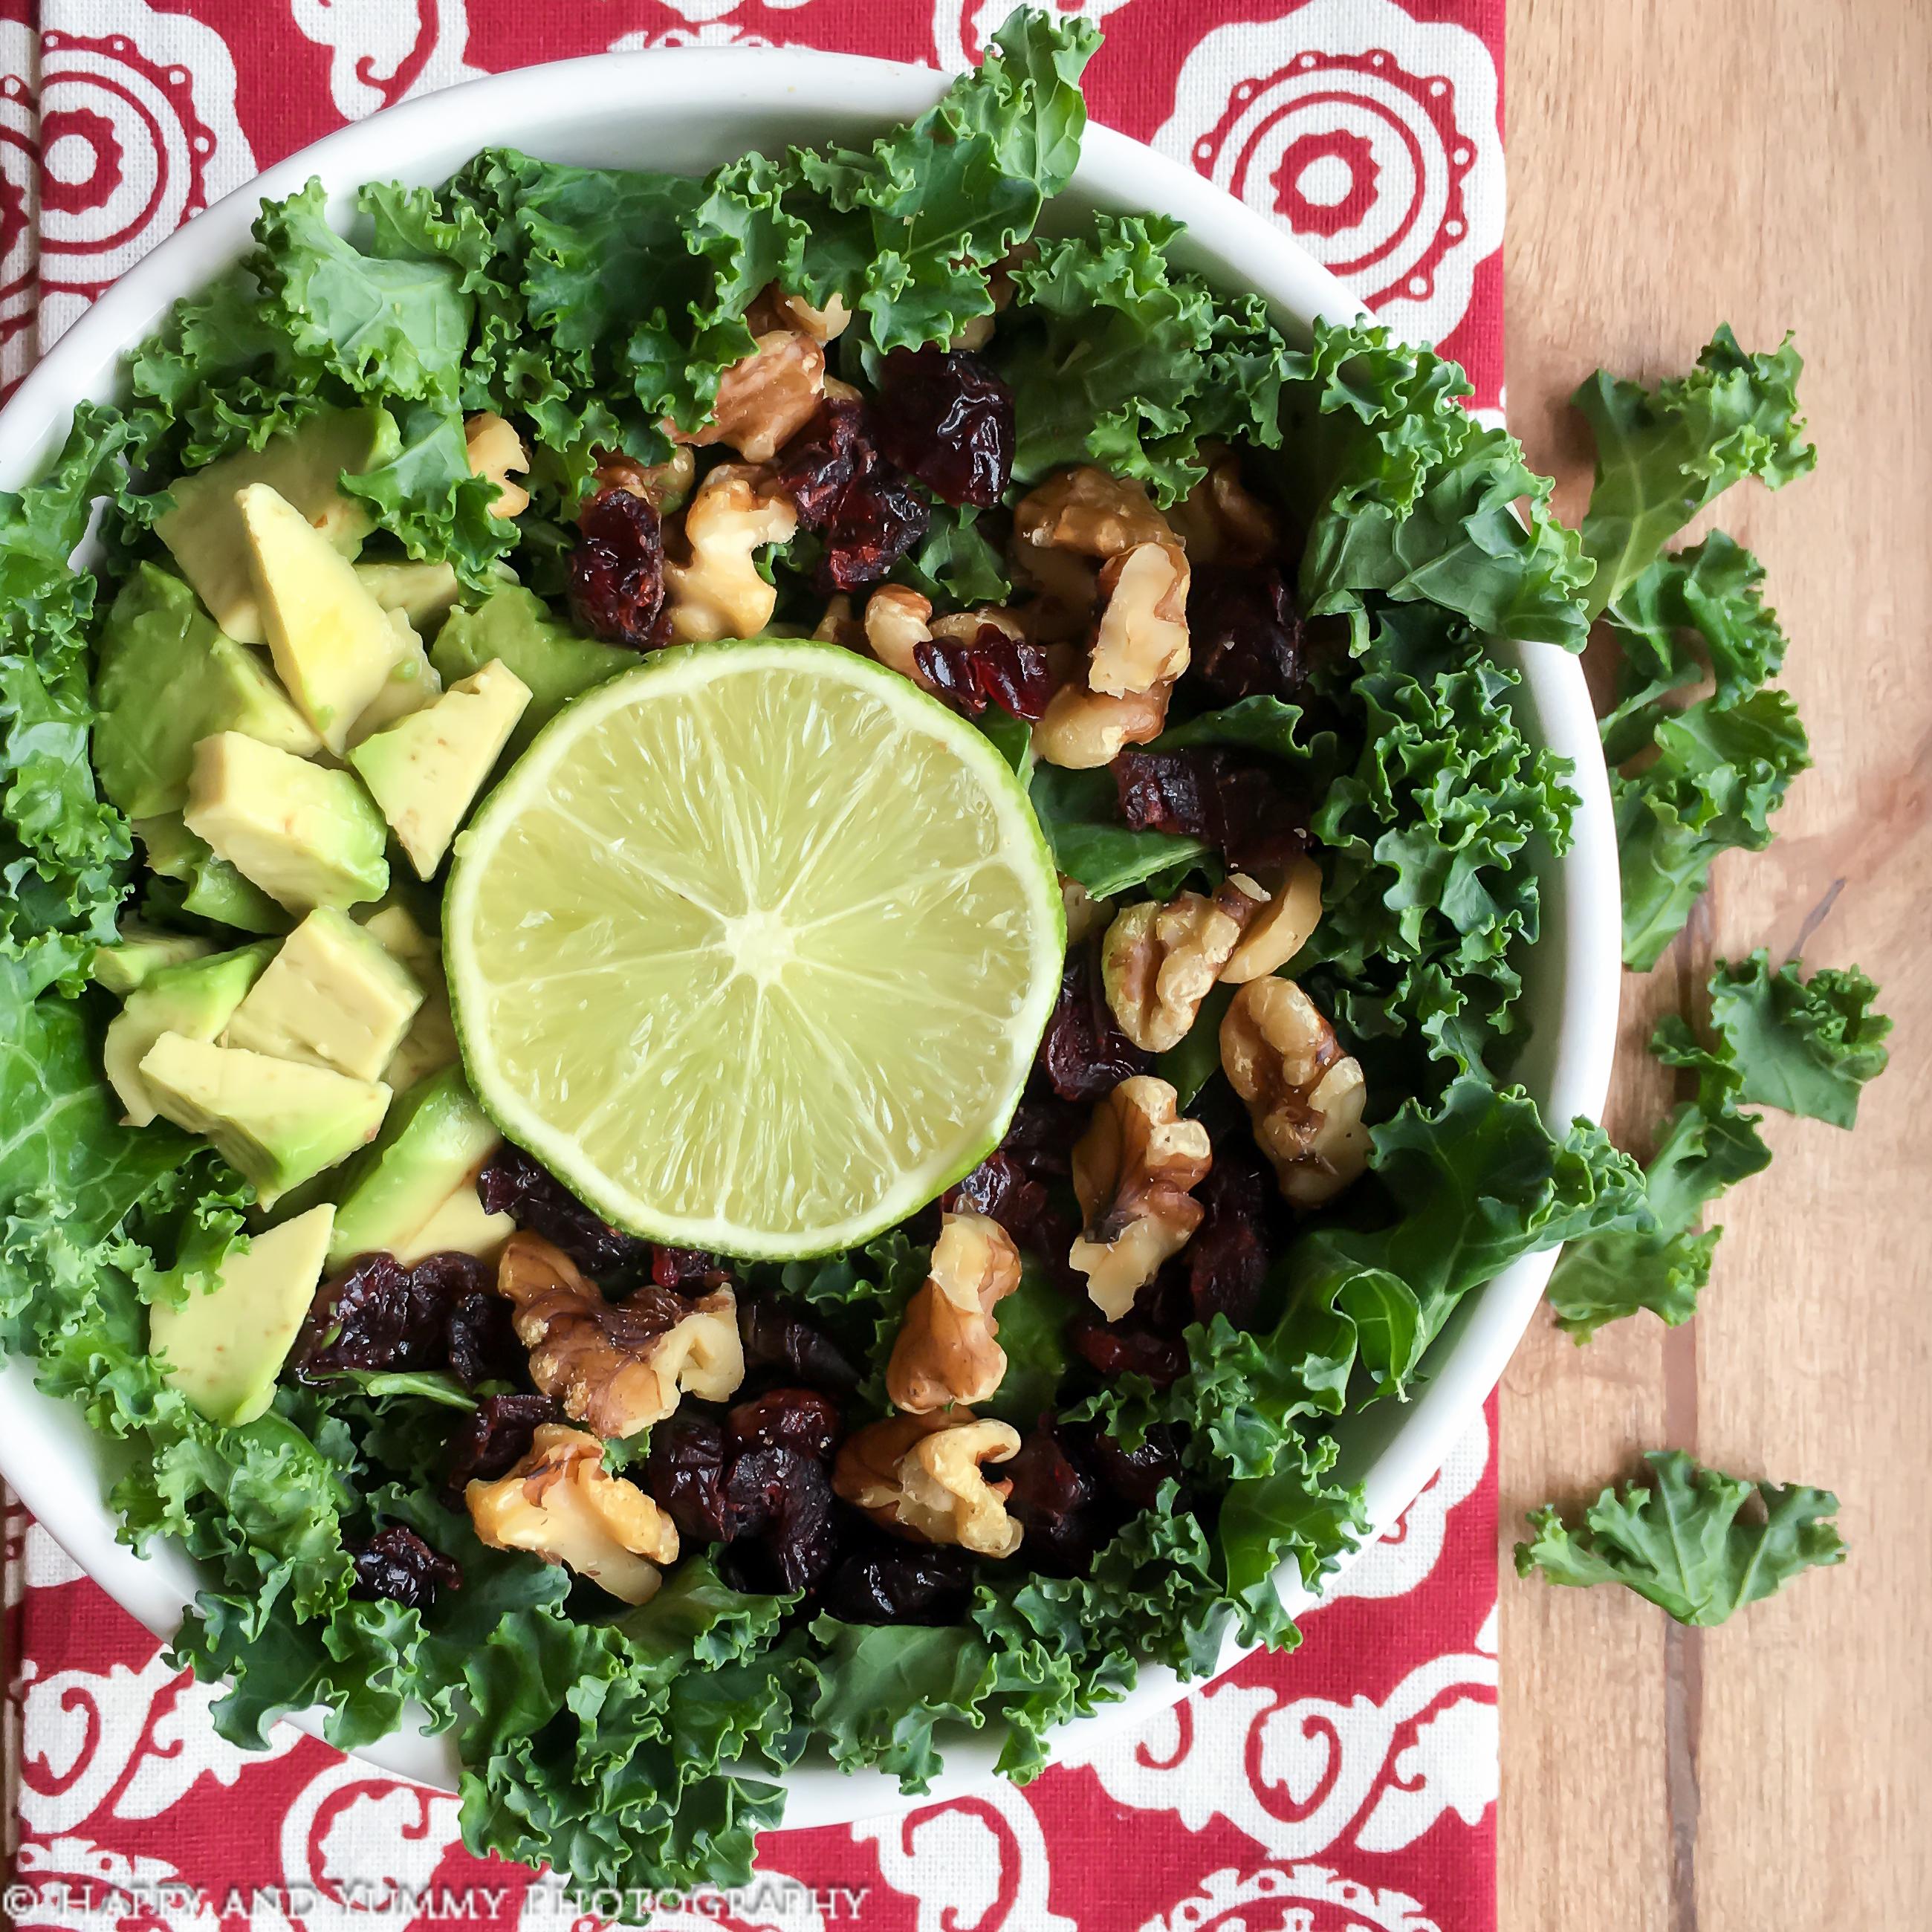 Lee's Kale and Avocado Salad